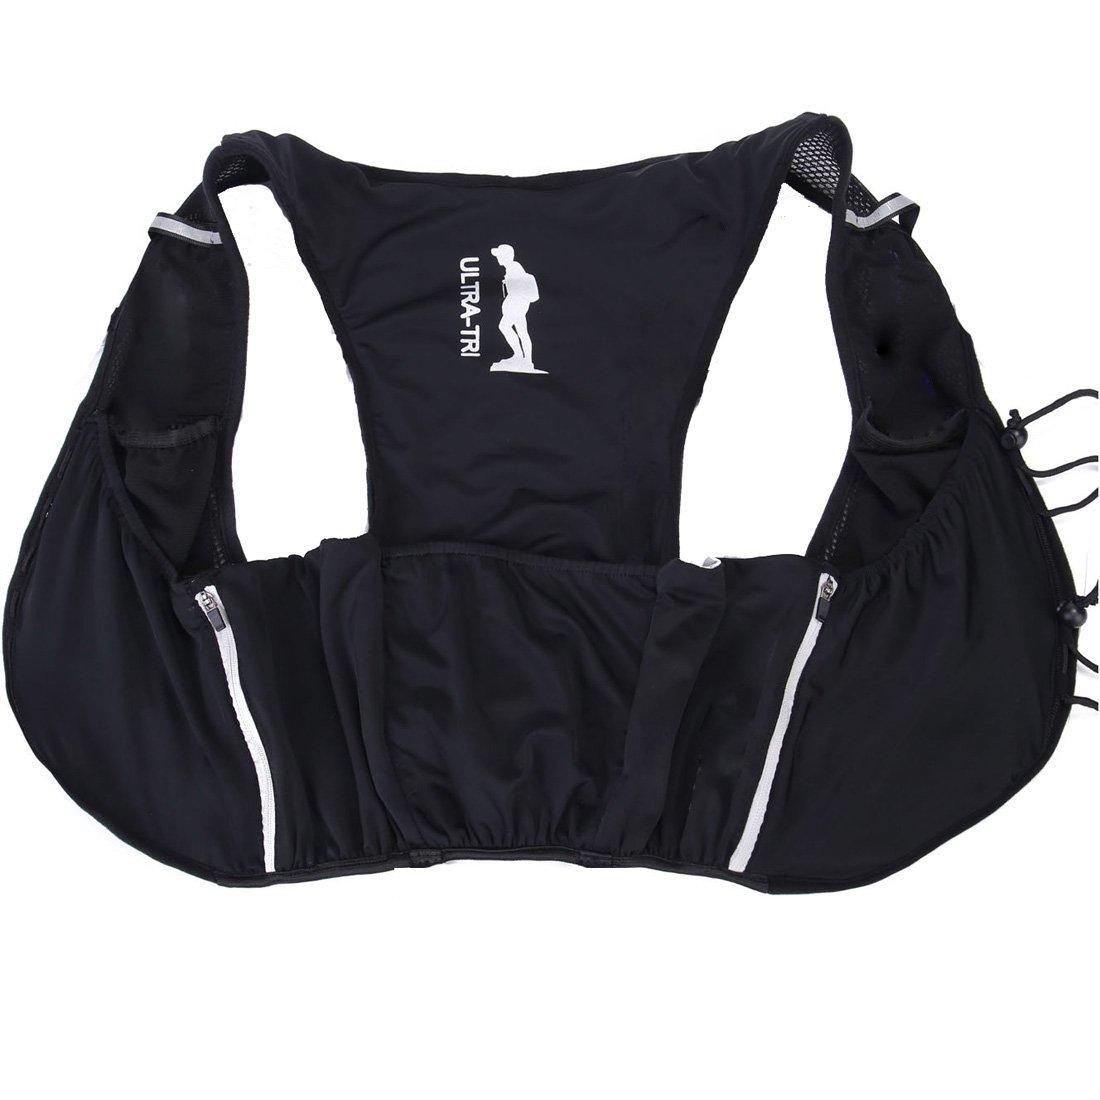 ultra-tri Lightweight RunningベストバックパックTrail RunアウトドアスポーツトレーニングRacingウォーターボトル水和膀胱バッグパック B078MLJSRK  Size M Backpack + 2 Soft Flasks